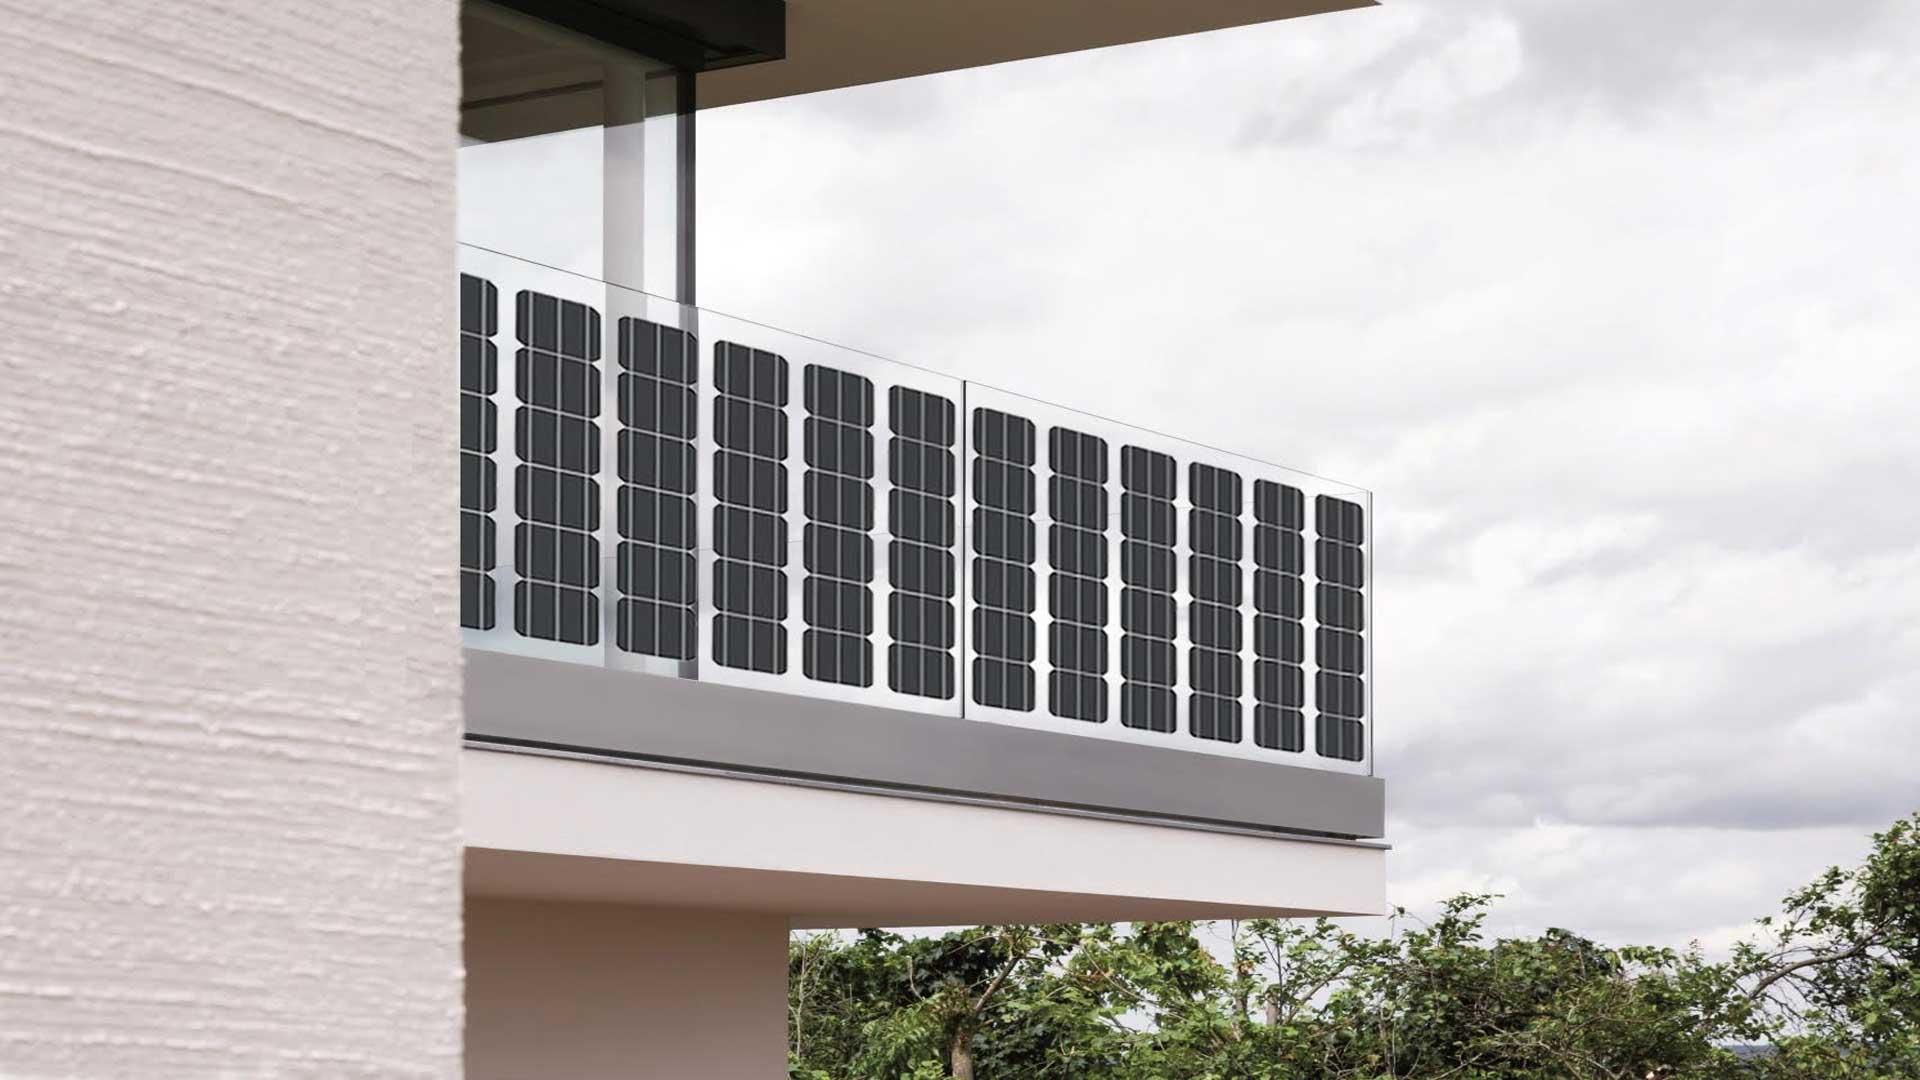 solare balkongel nder von a2 solar. Black Bedroom Furniture Sets. Home Design Ideas